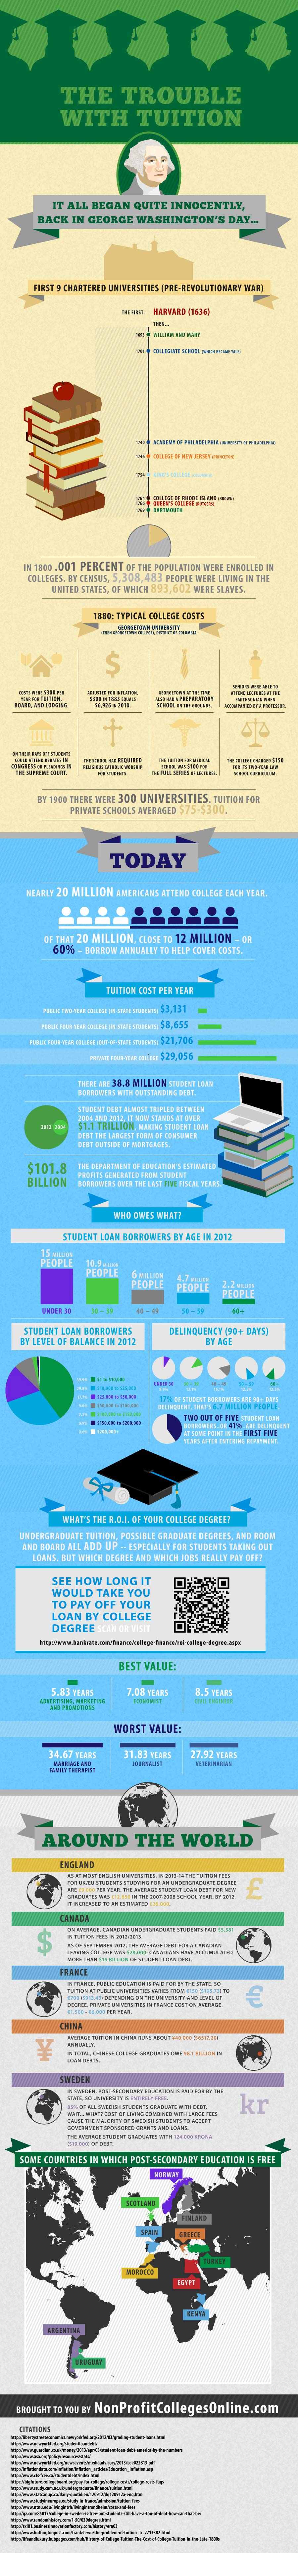 Student Loan Debt Crisis 2012-Infographic